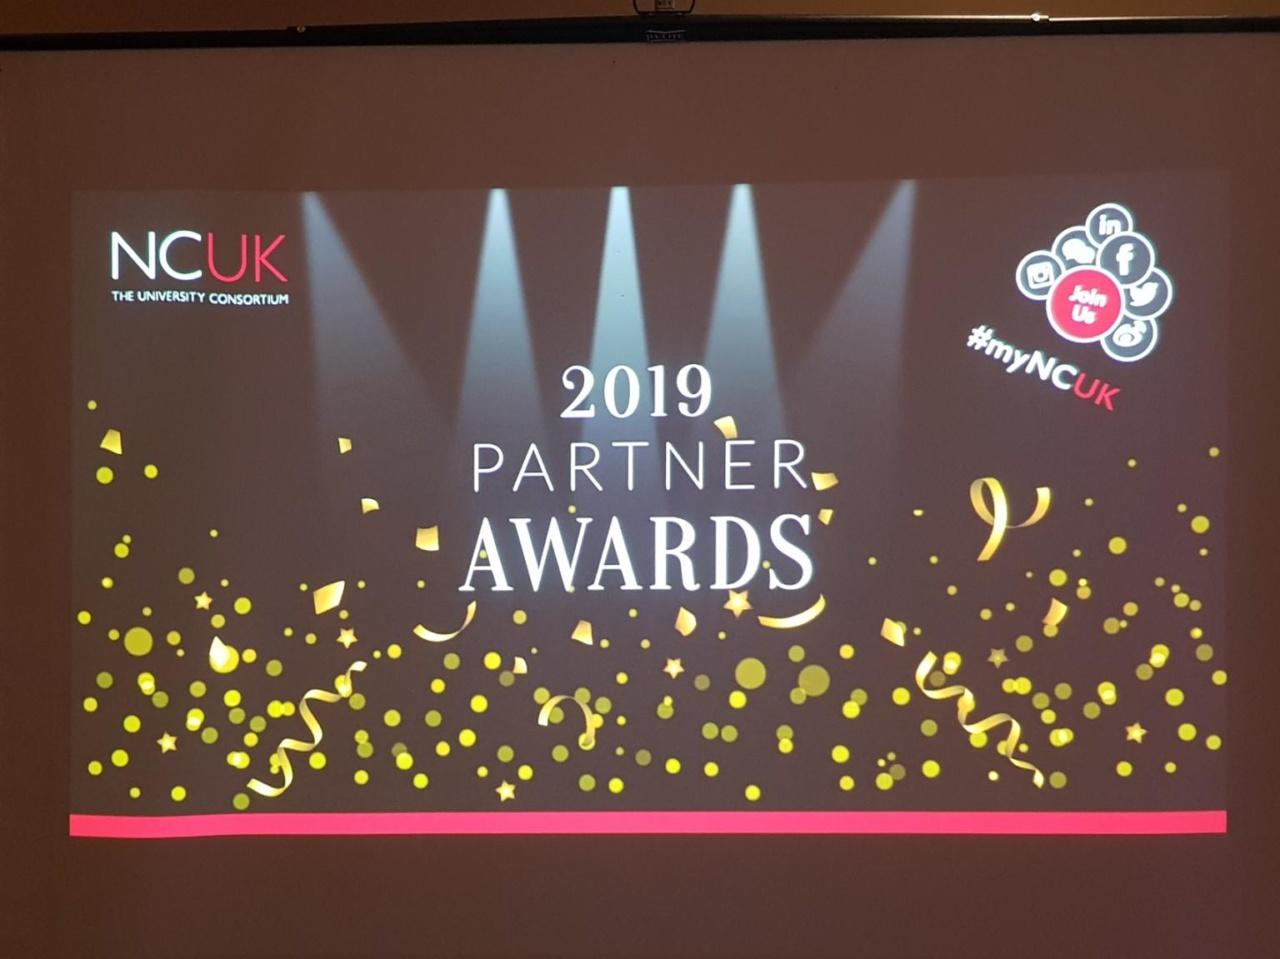 ncuk partner awards 2019